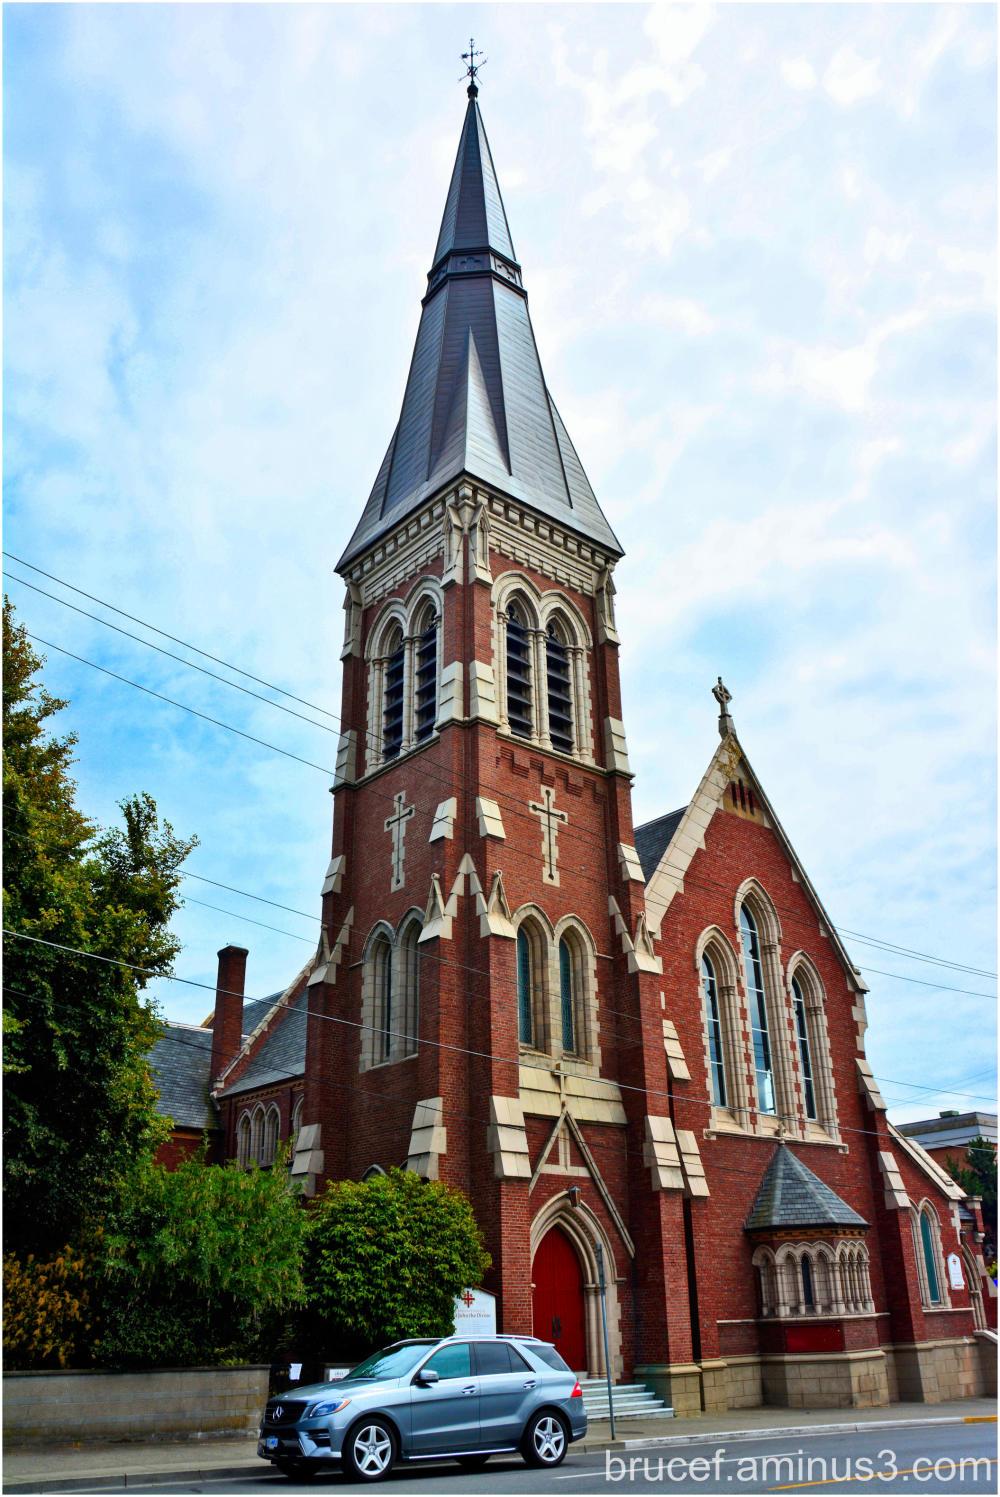 The Church of St. John